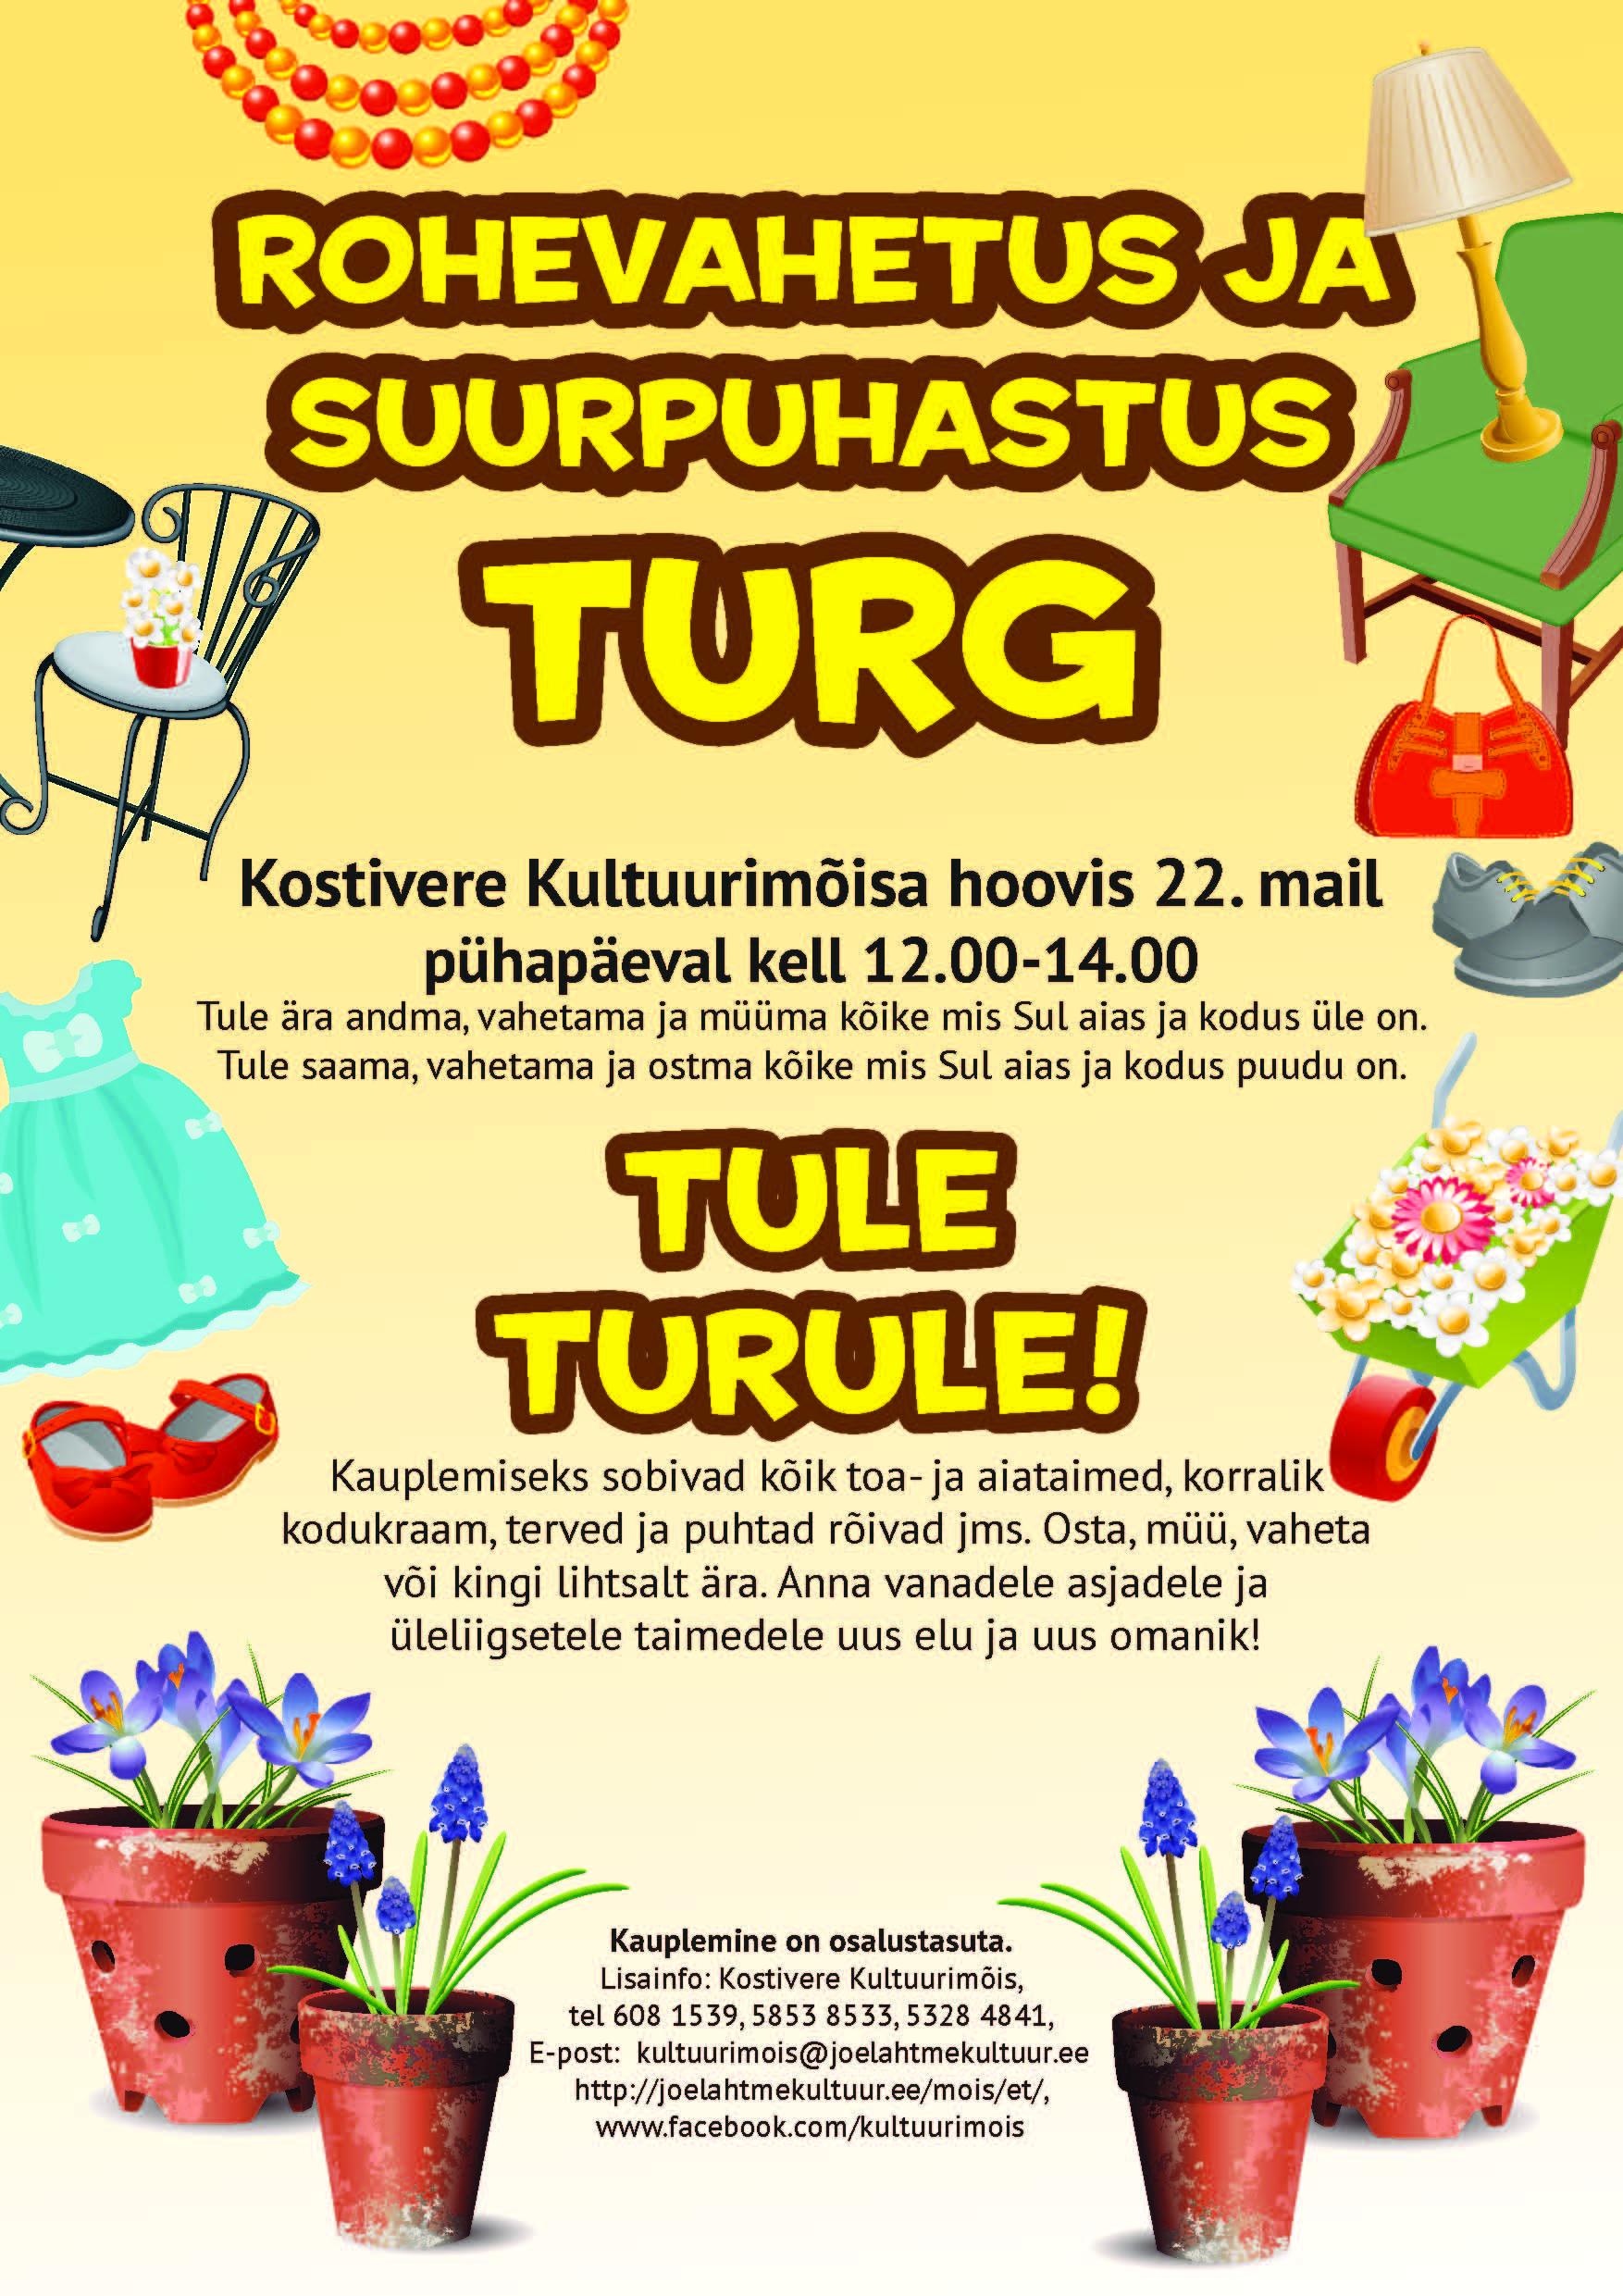 TURG.jpg2